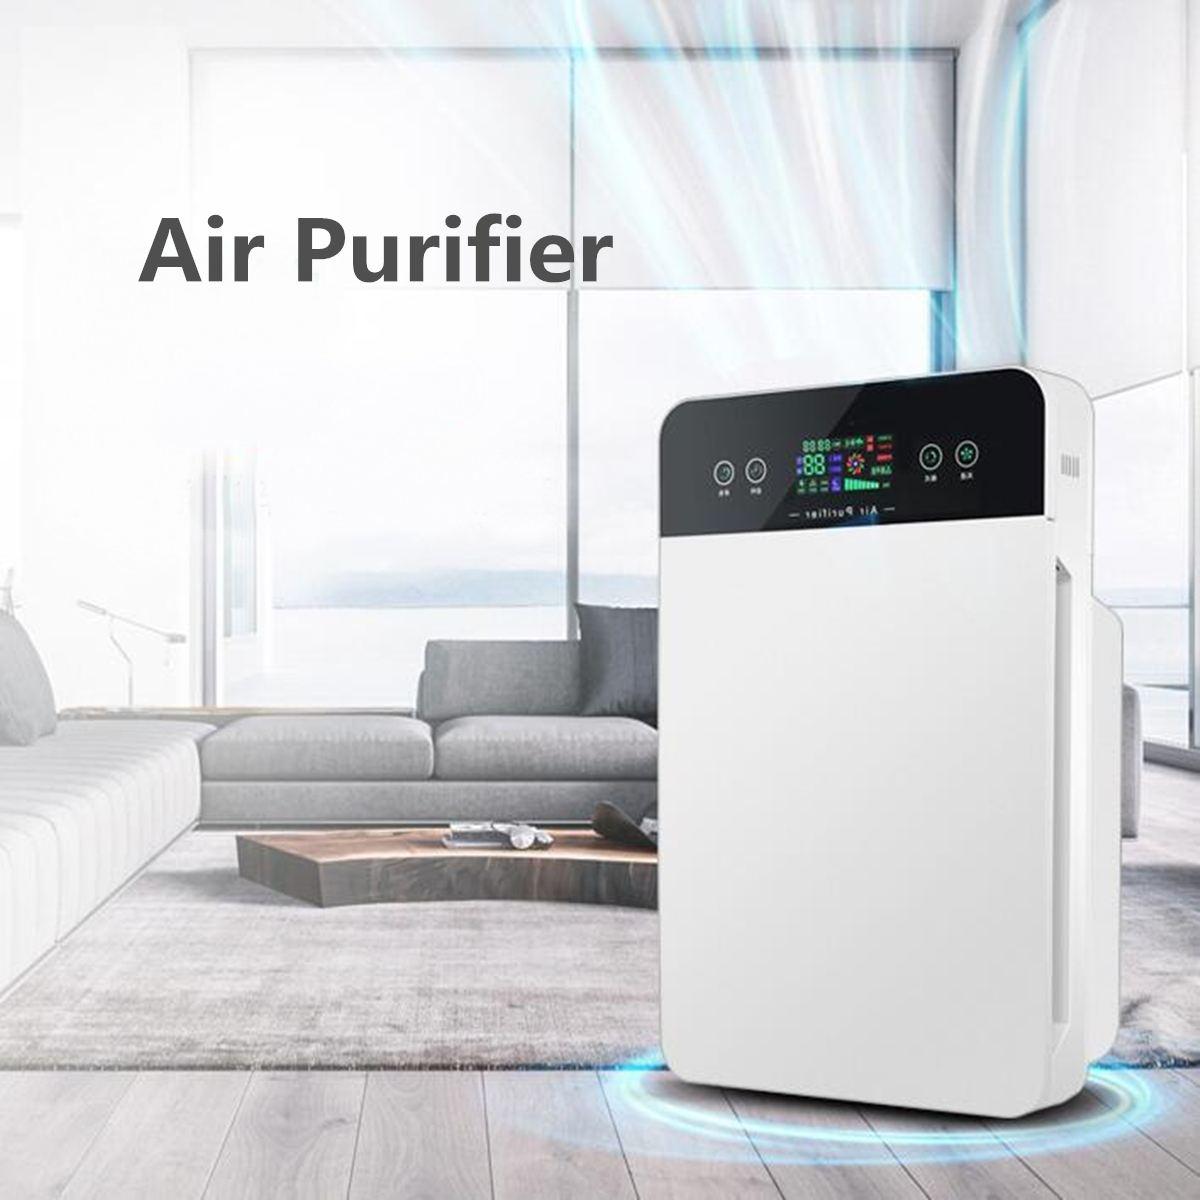 Smart Air Purifier Electric Intelligent Dehumidifiers Purify Smoke Air Dryer Machine Moisture Absorb Home Household Appliances